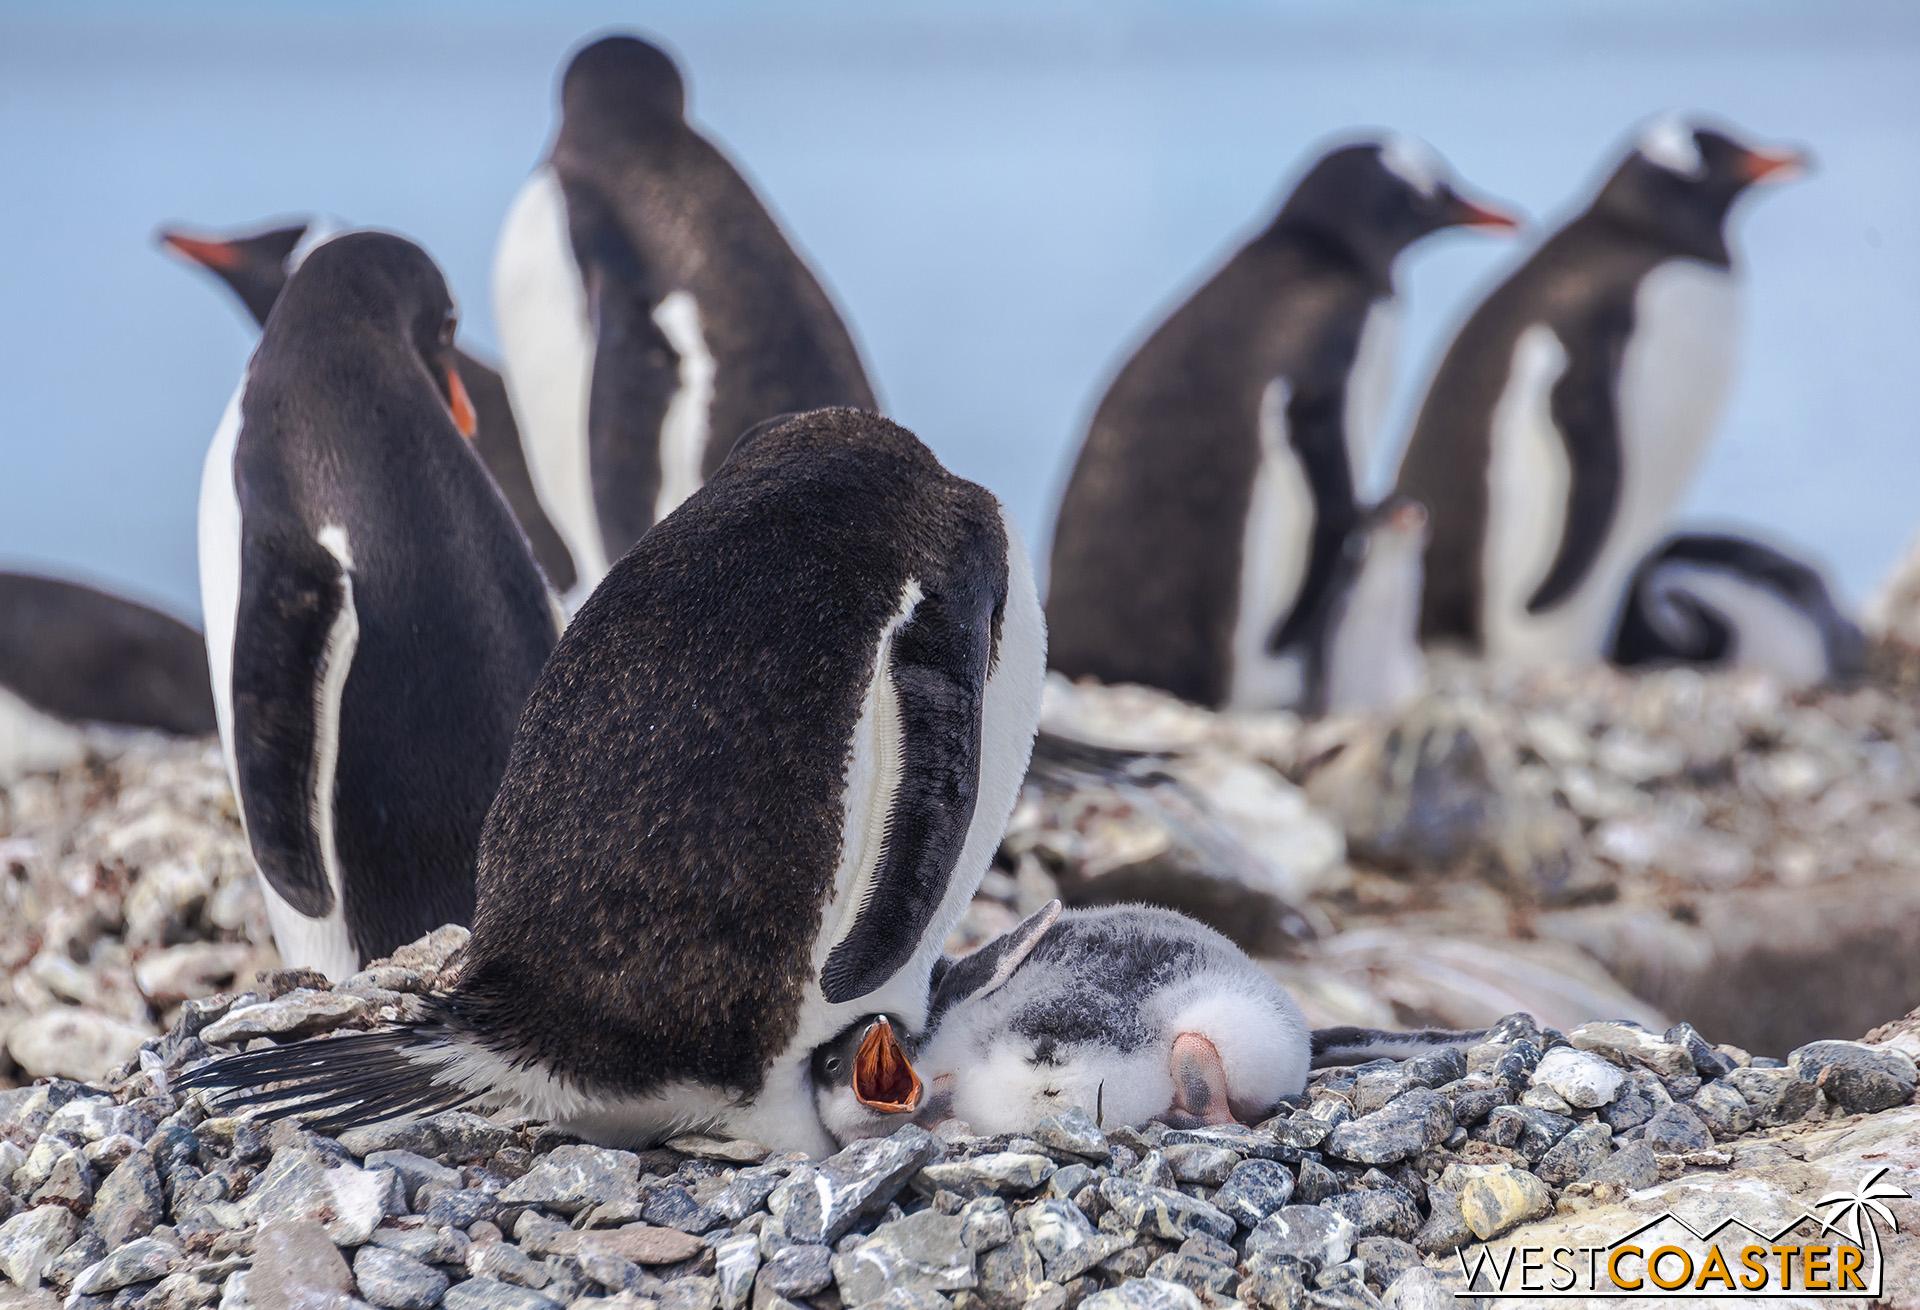 Penguins on a neighboring island at Port Lockroy.